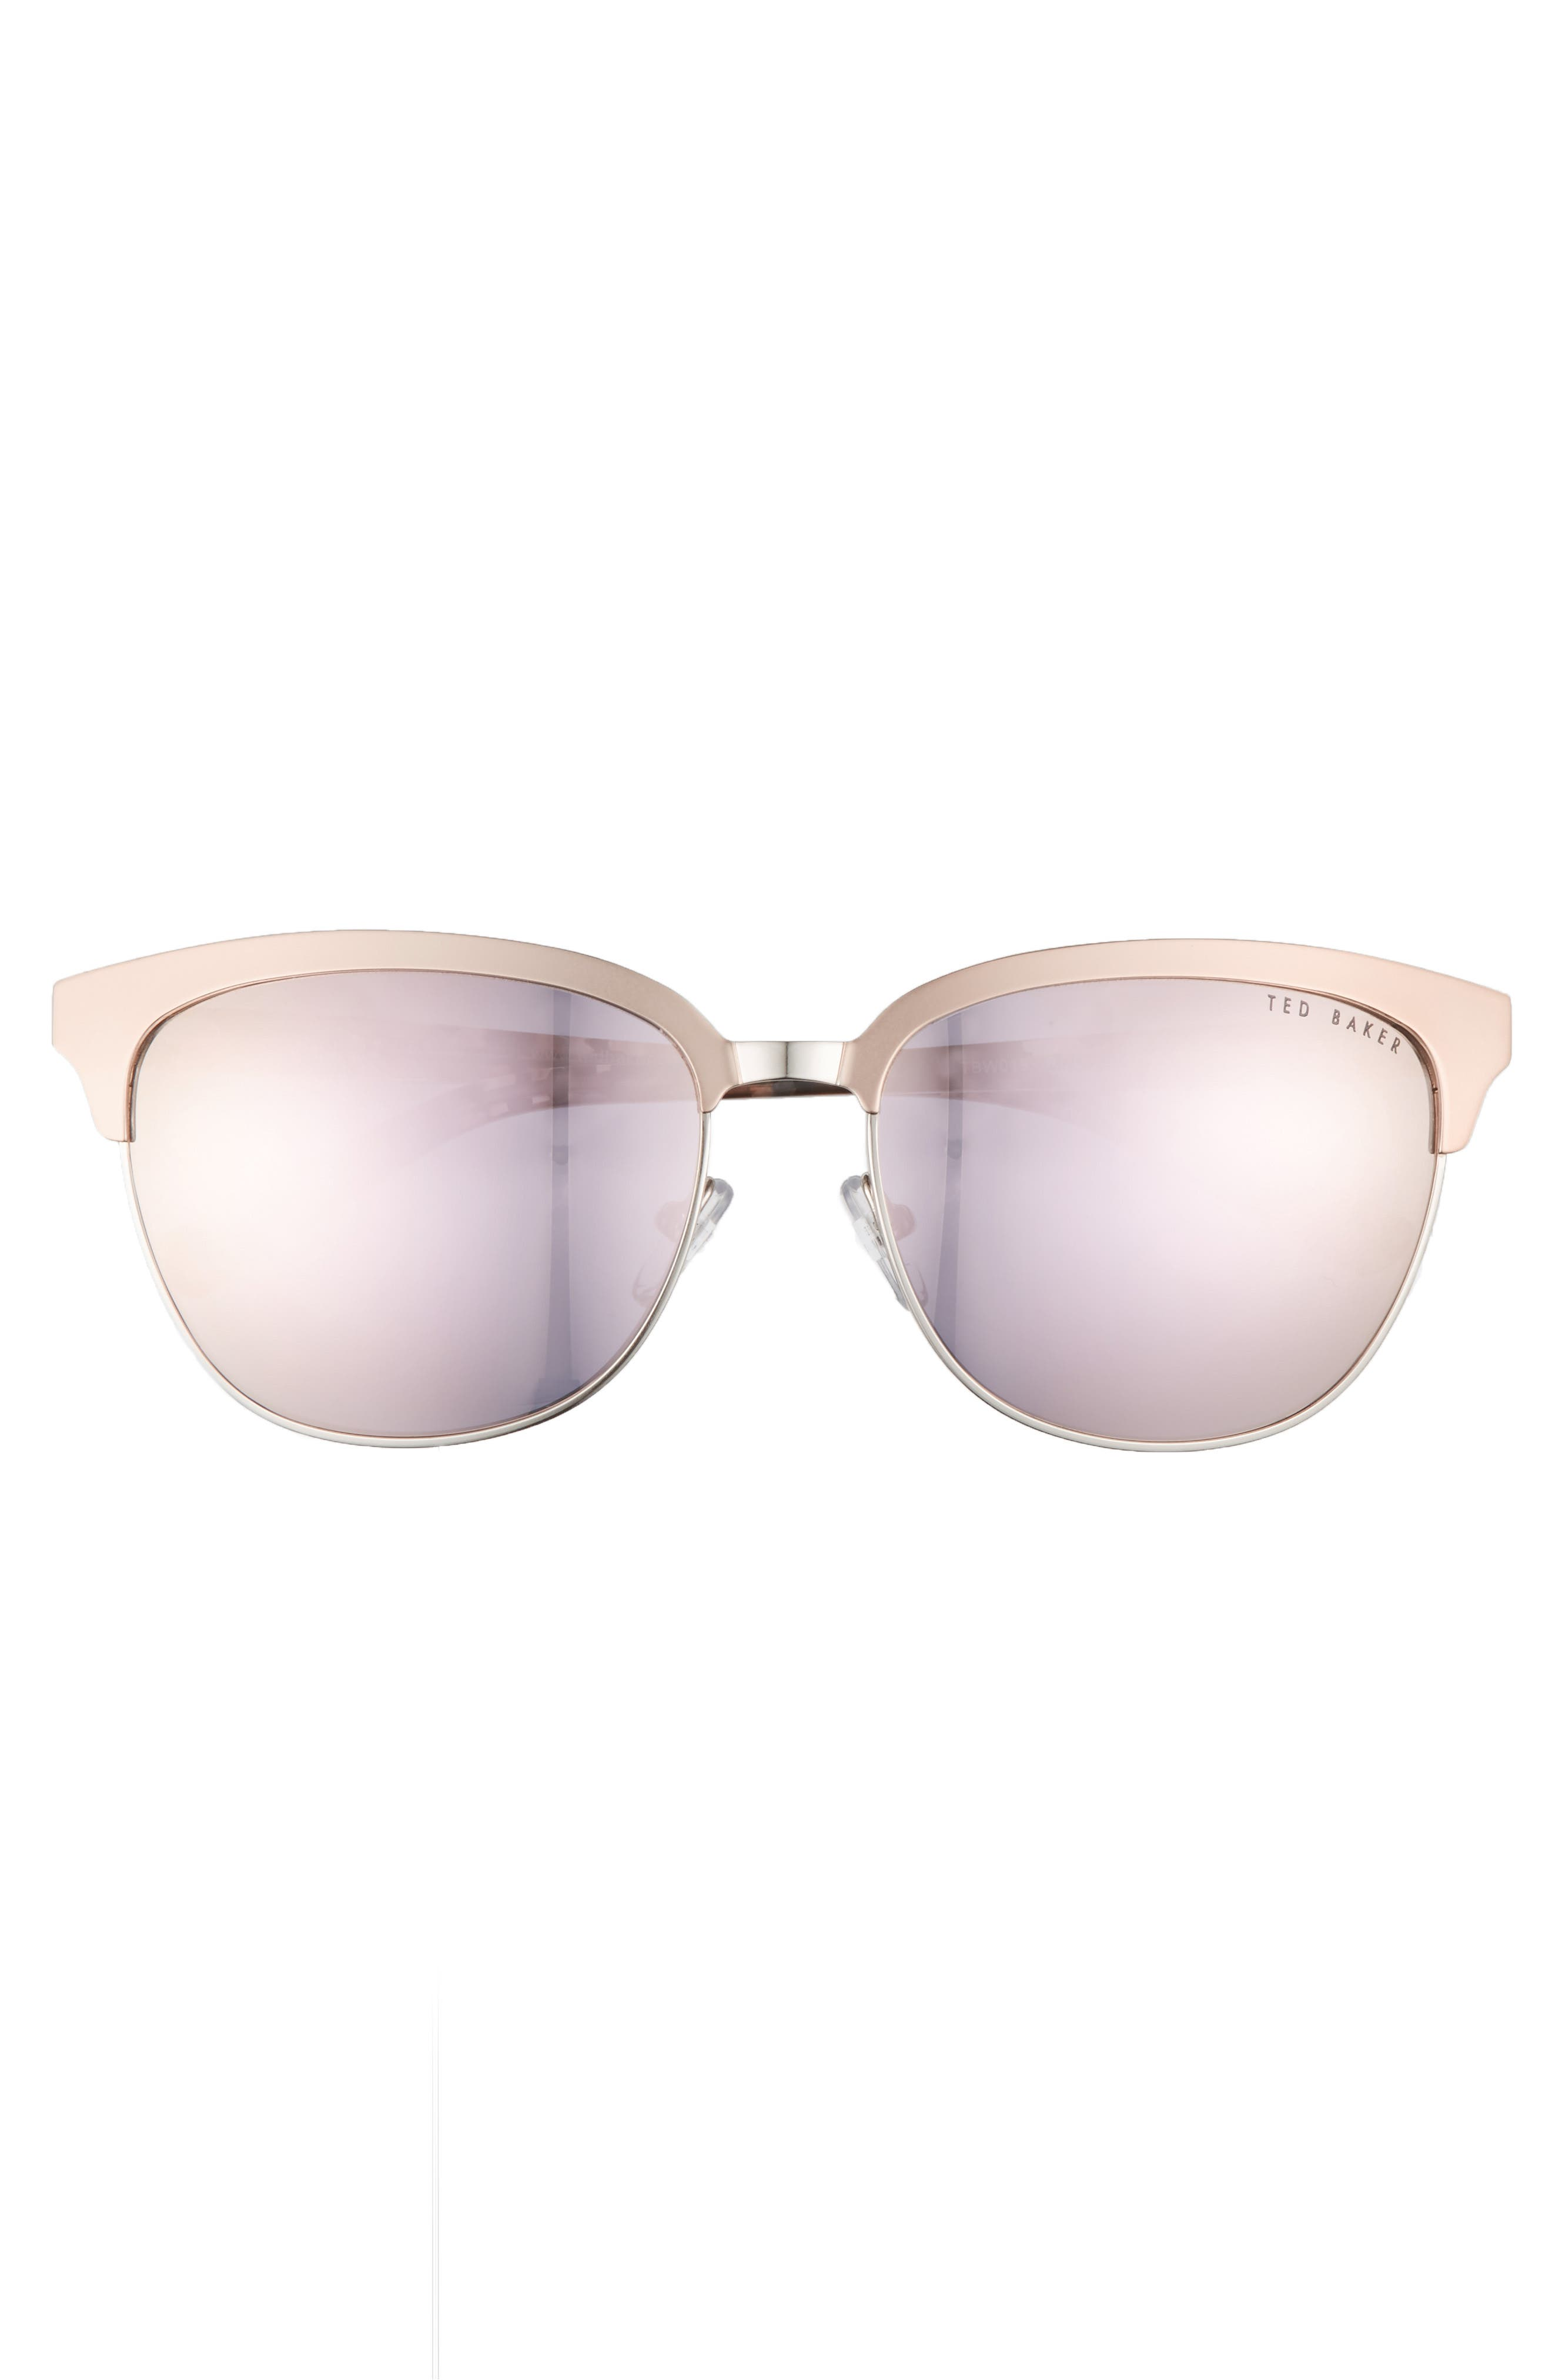 Alternate Image 3  - Ted Baker London 57mm Mirrored Sunglasses